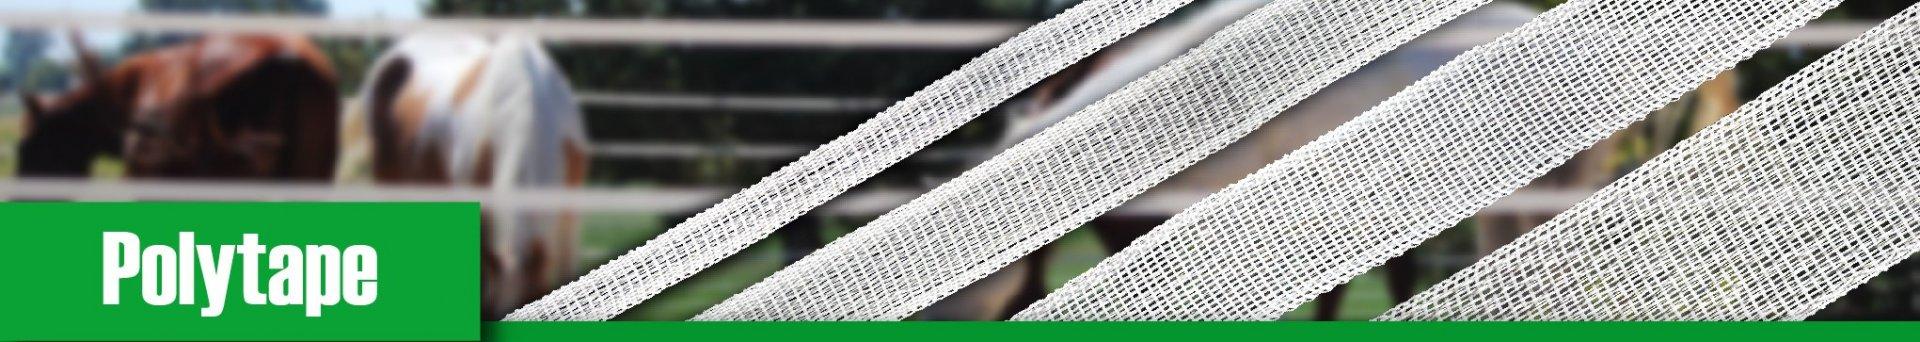 Polytape Powerfields High Quality Electric Fence